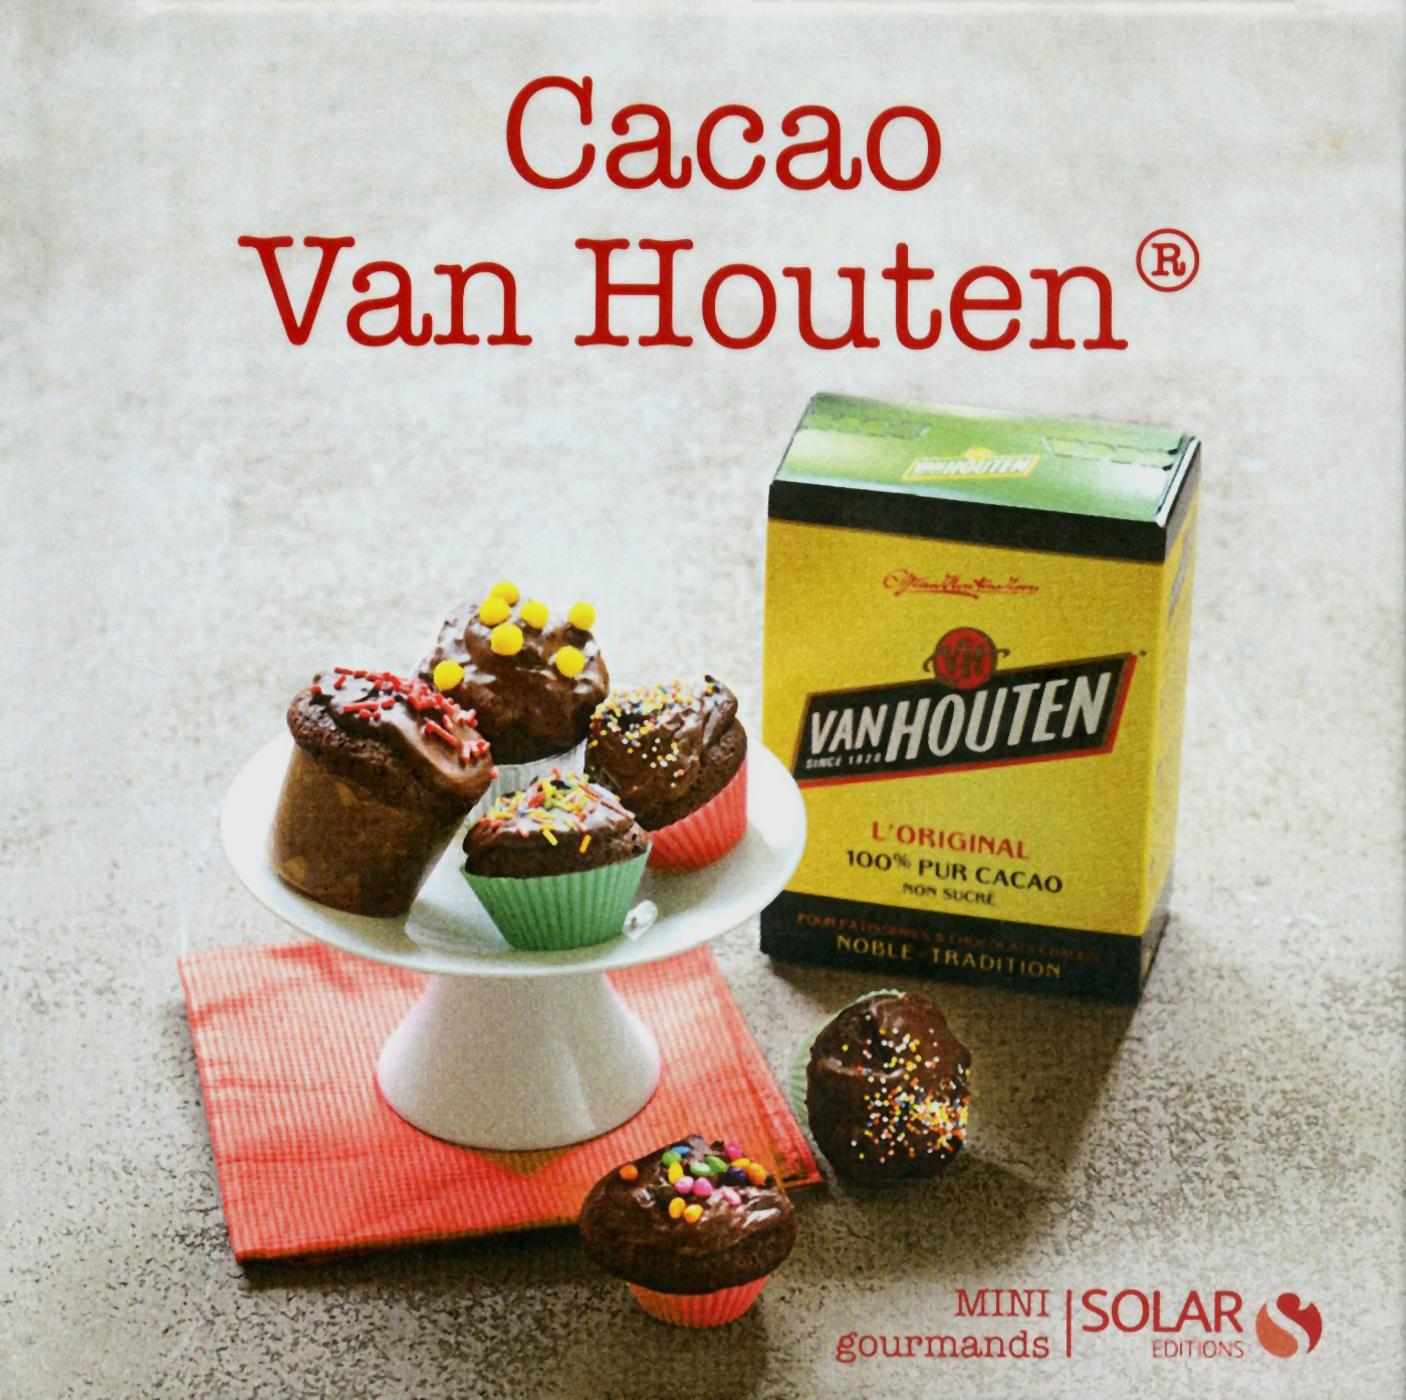 Cacao Van Houten - Mini gourmands